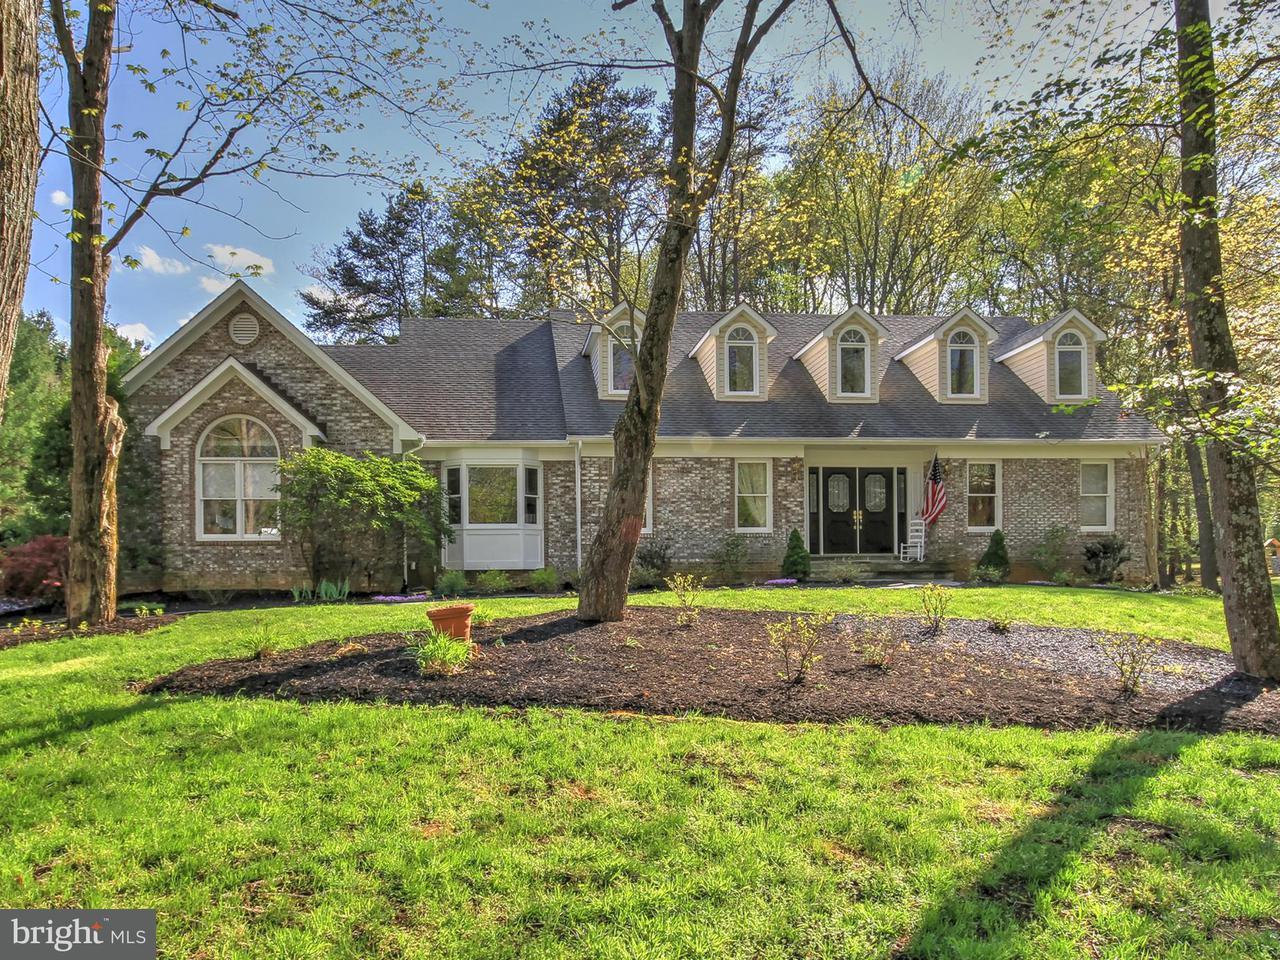 Single Family Home for Sale at 9715 LINDSAY BLAKE Lane 9715 LINDSAY BLAKE Lane Great Falls, Virginia 22066 United States